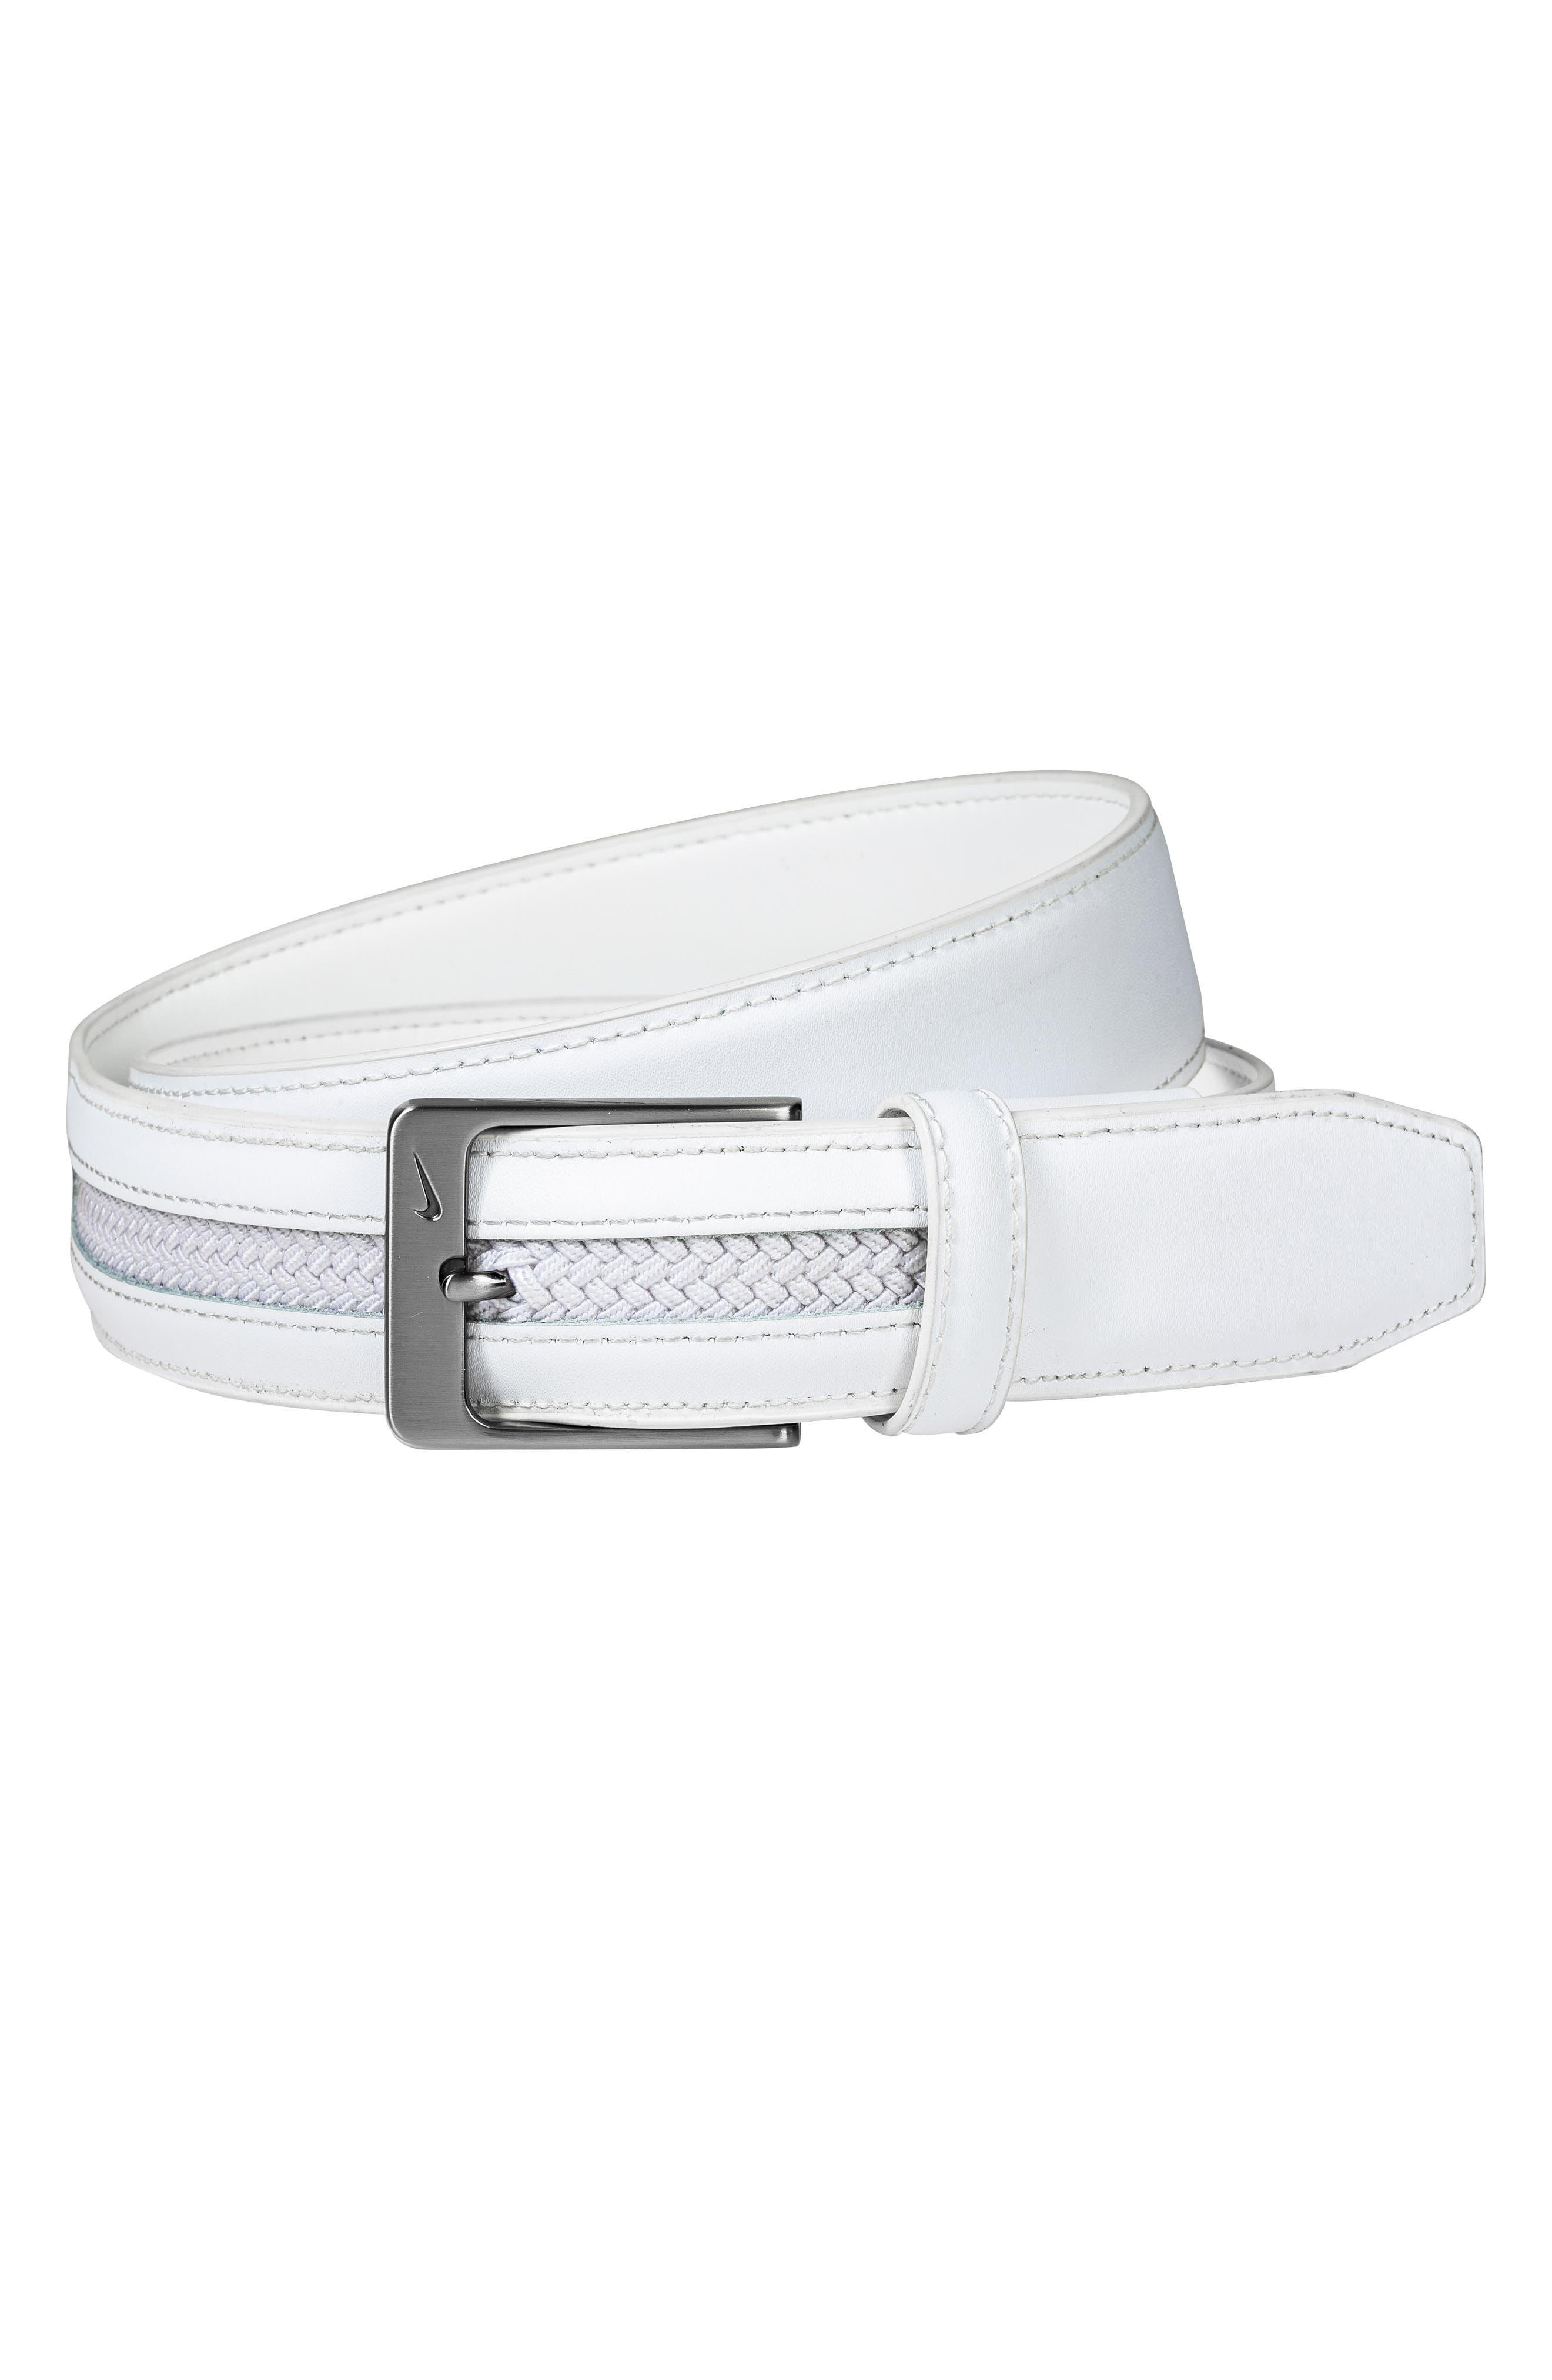 Nike G-Flex Woven Leather Belt, White